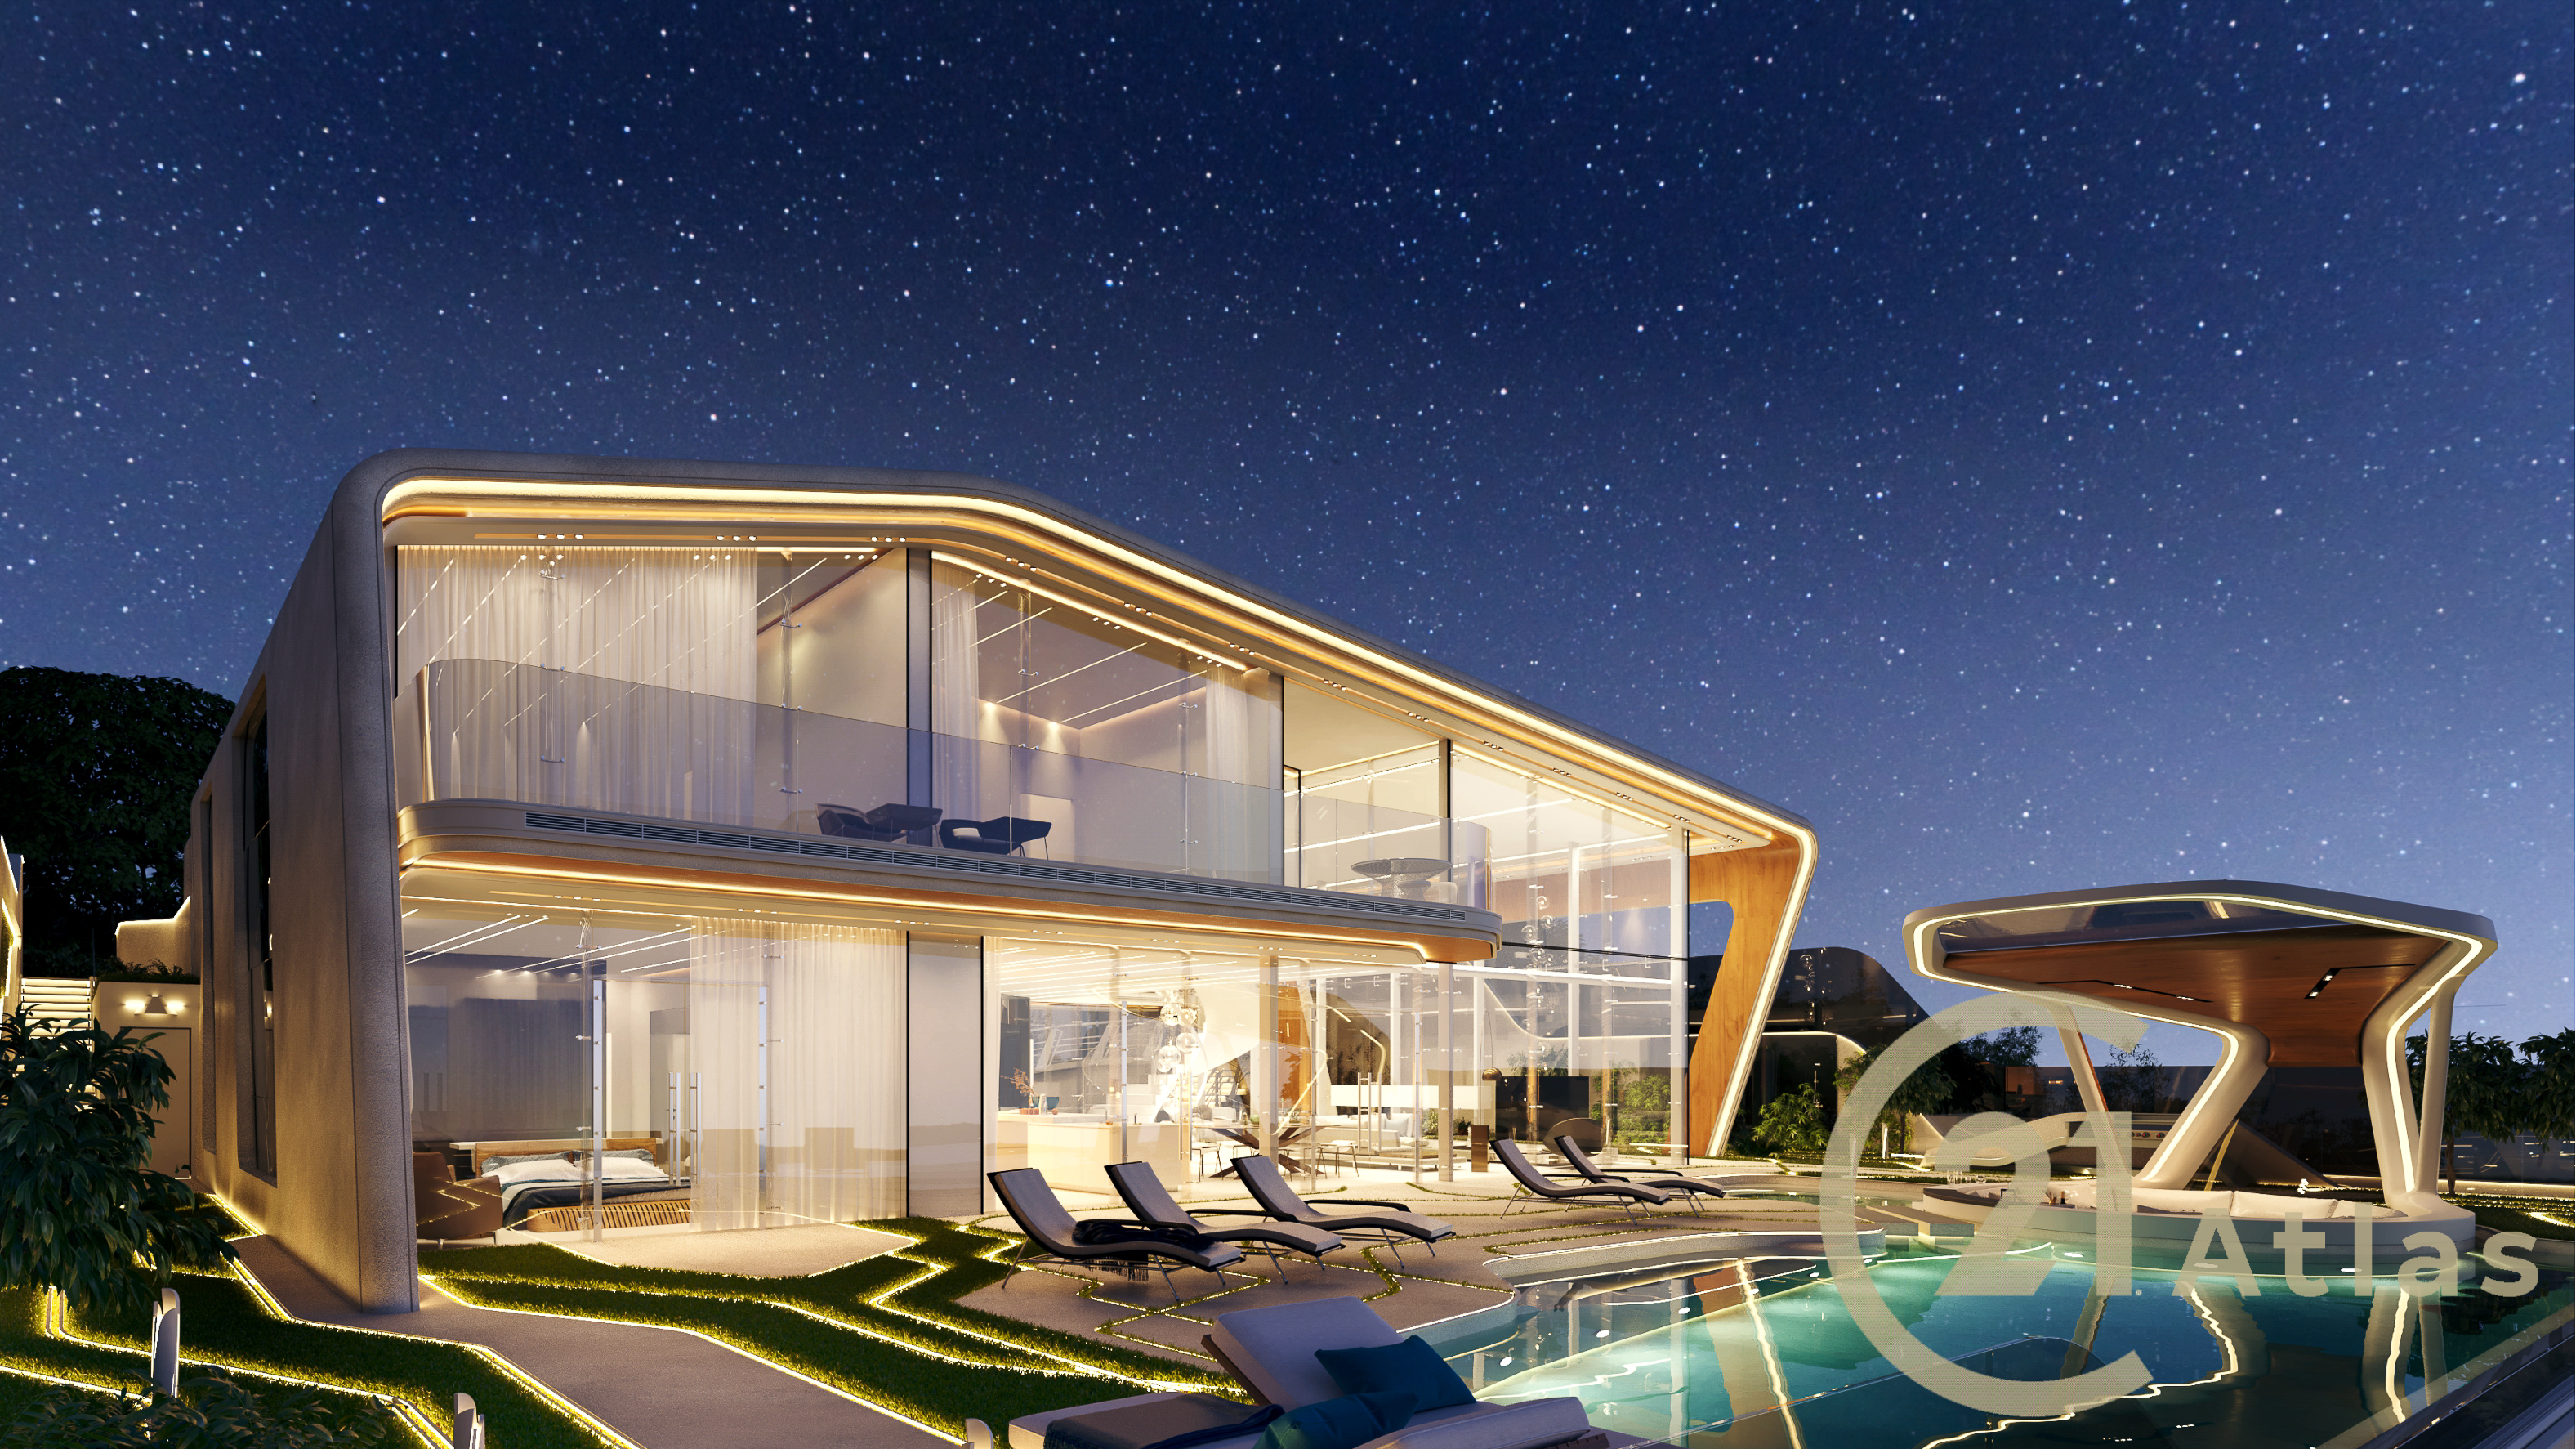 Stylish and contemporary luxury pool villa